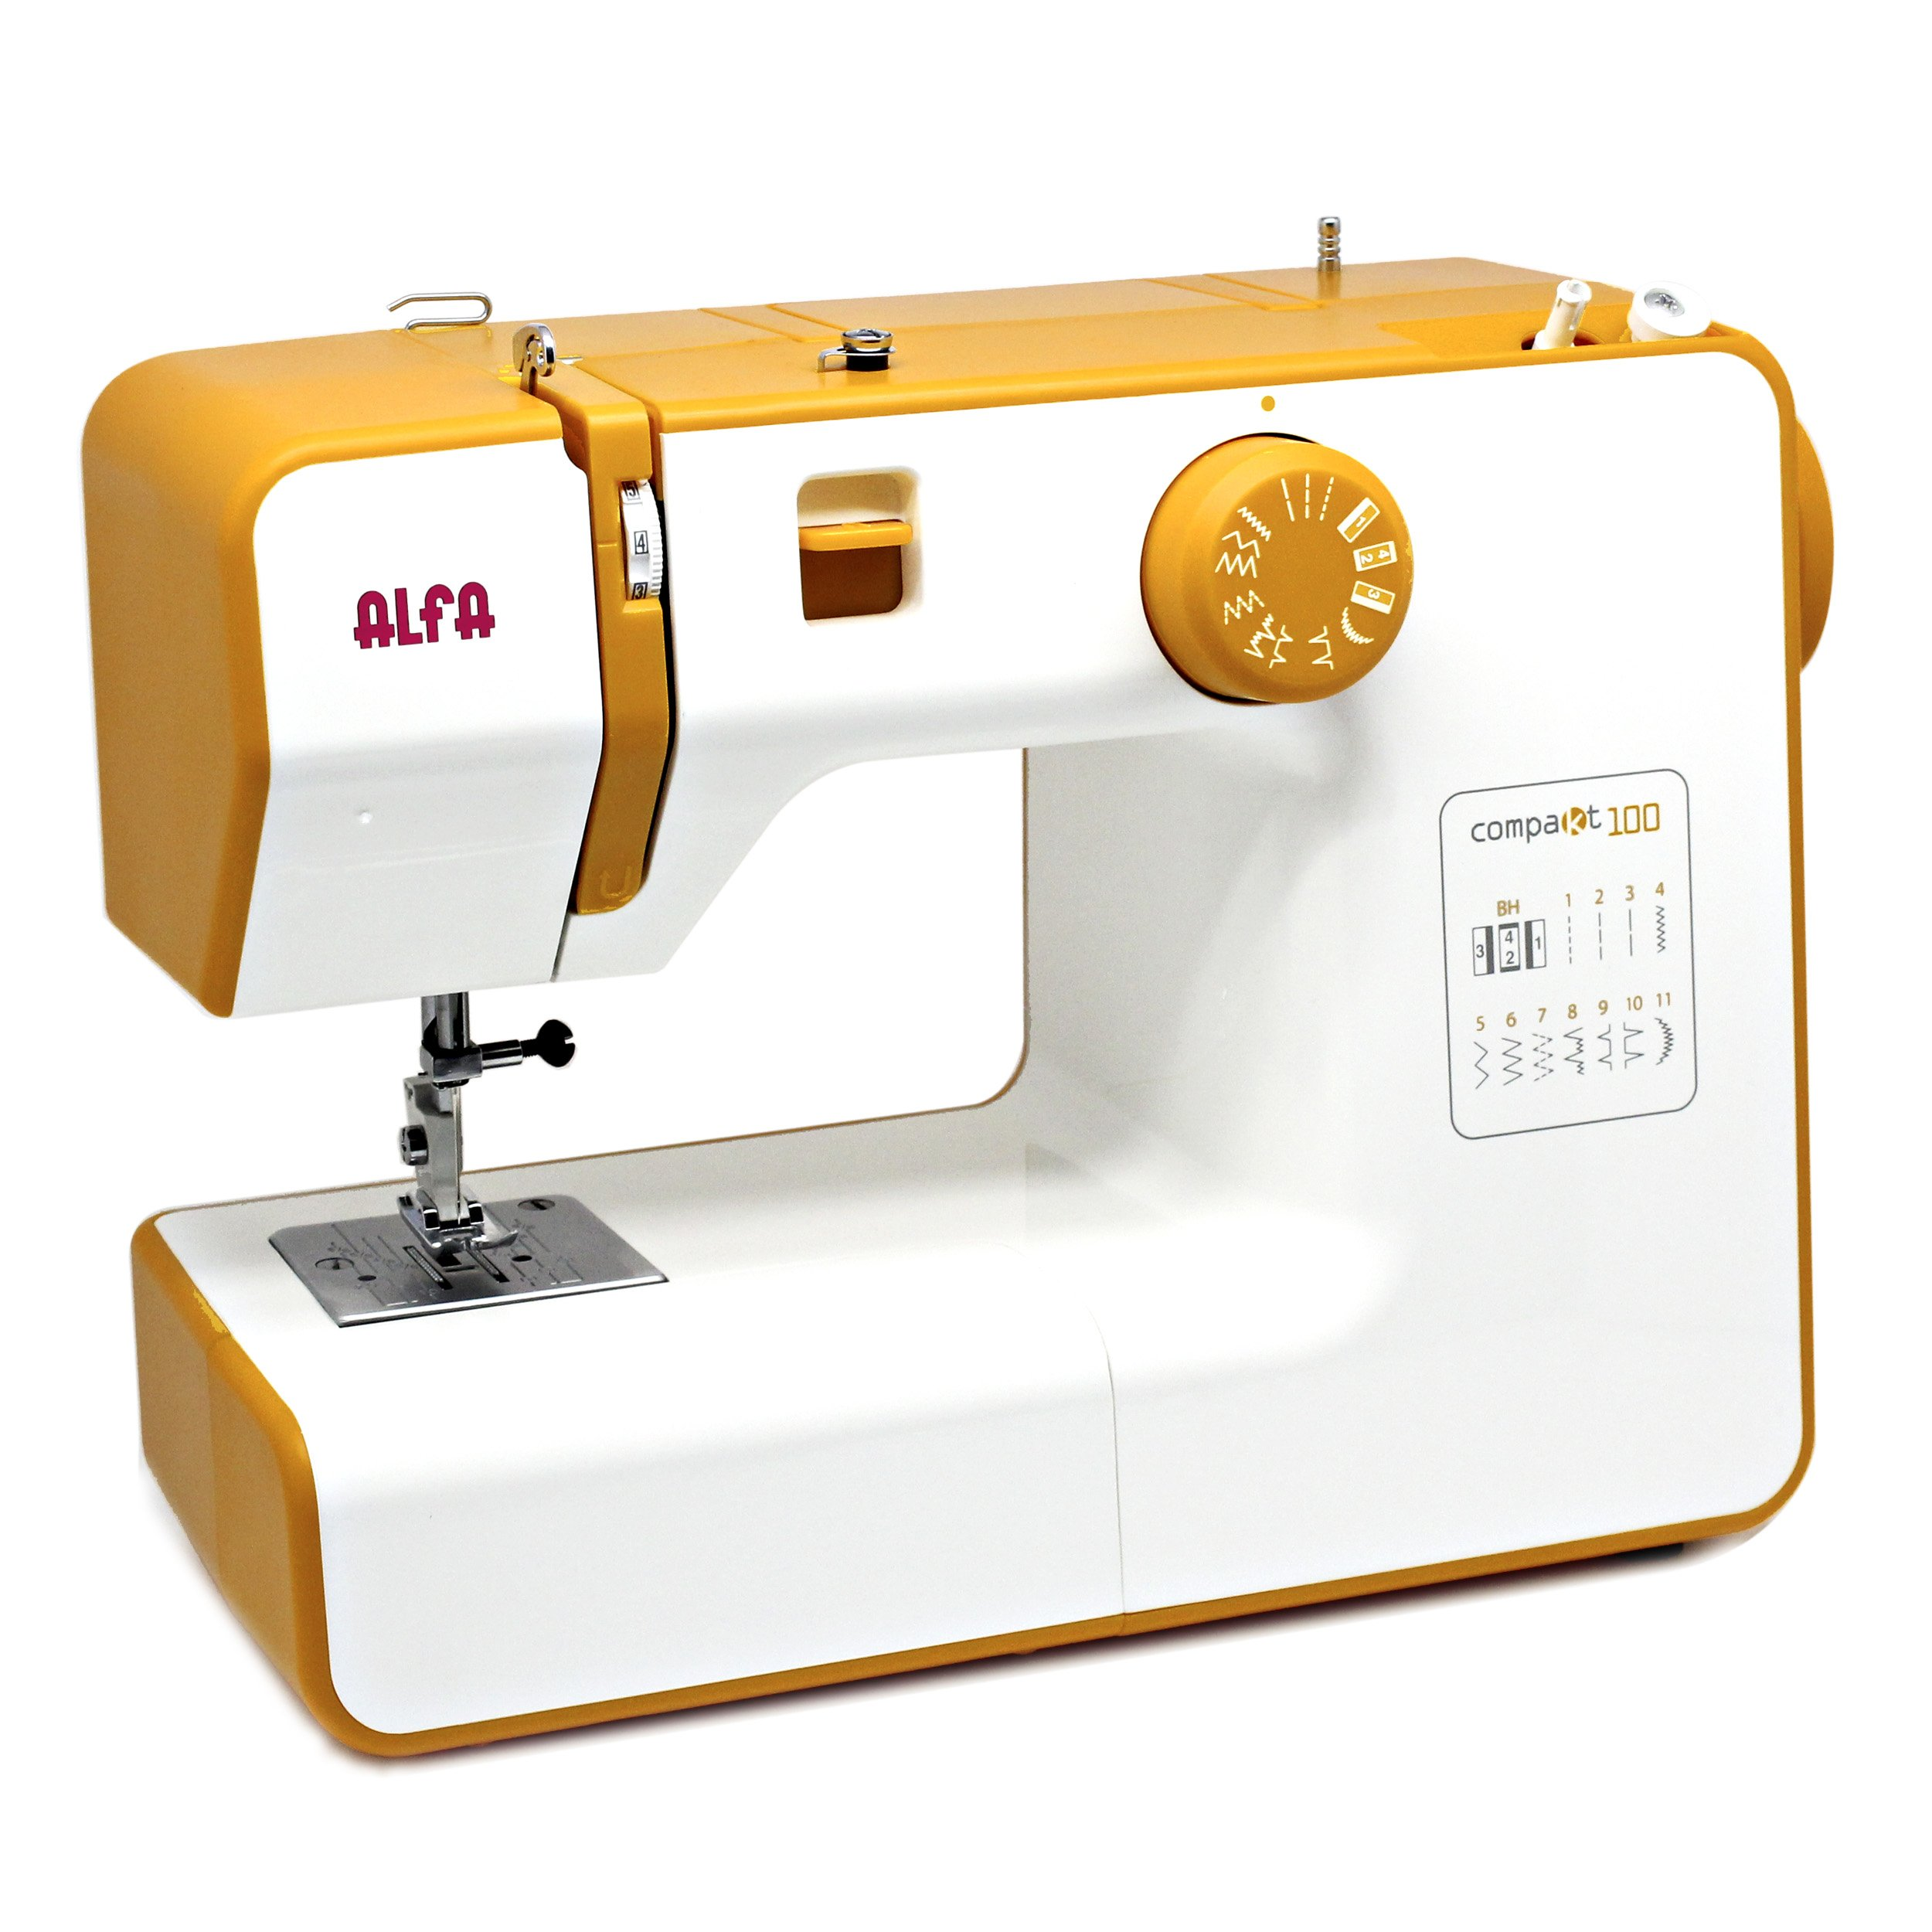 Alfa COMPAKT 100 - Máquina de coser compacta y portátil, color amarillo product image